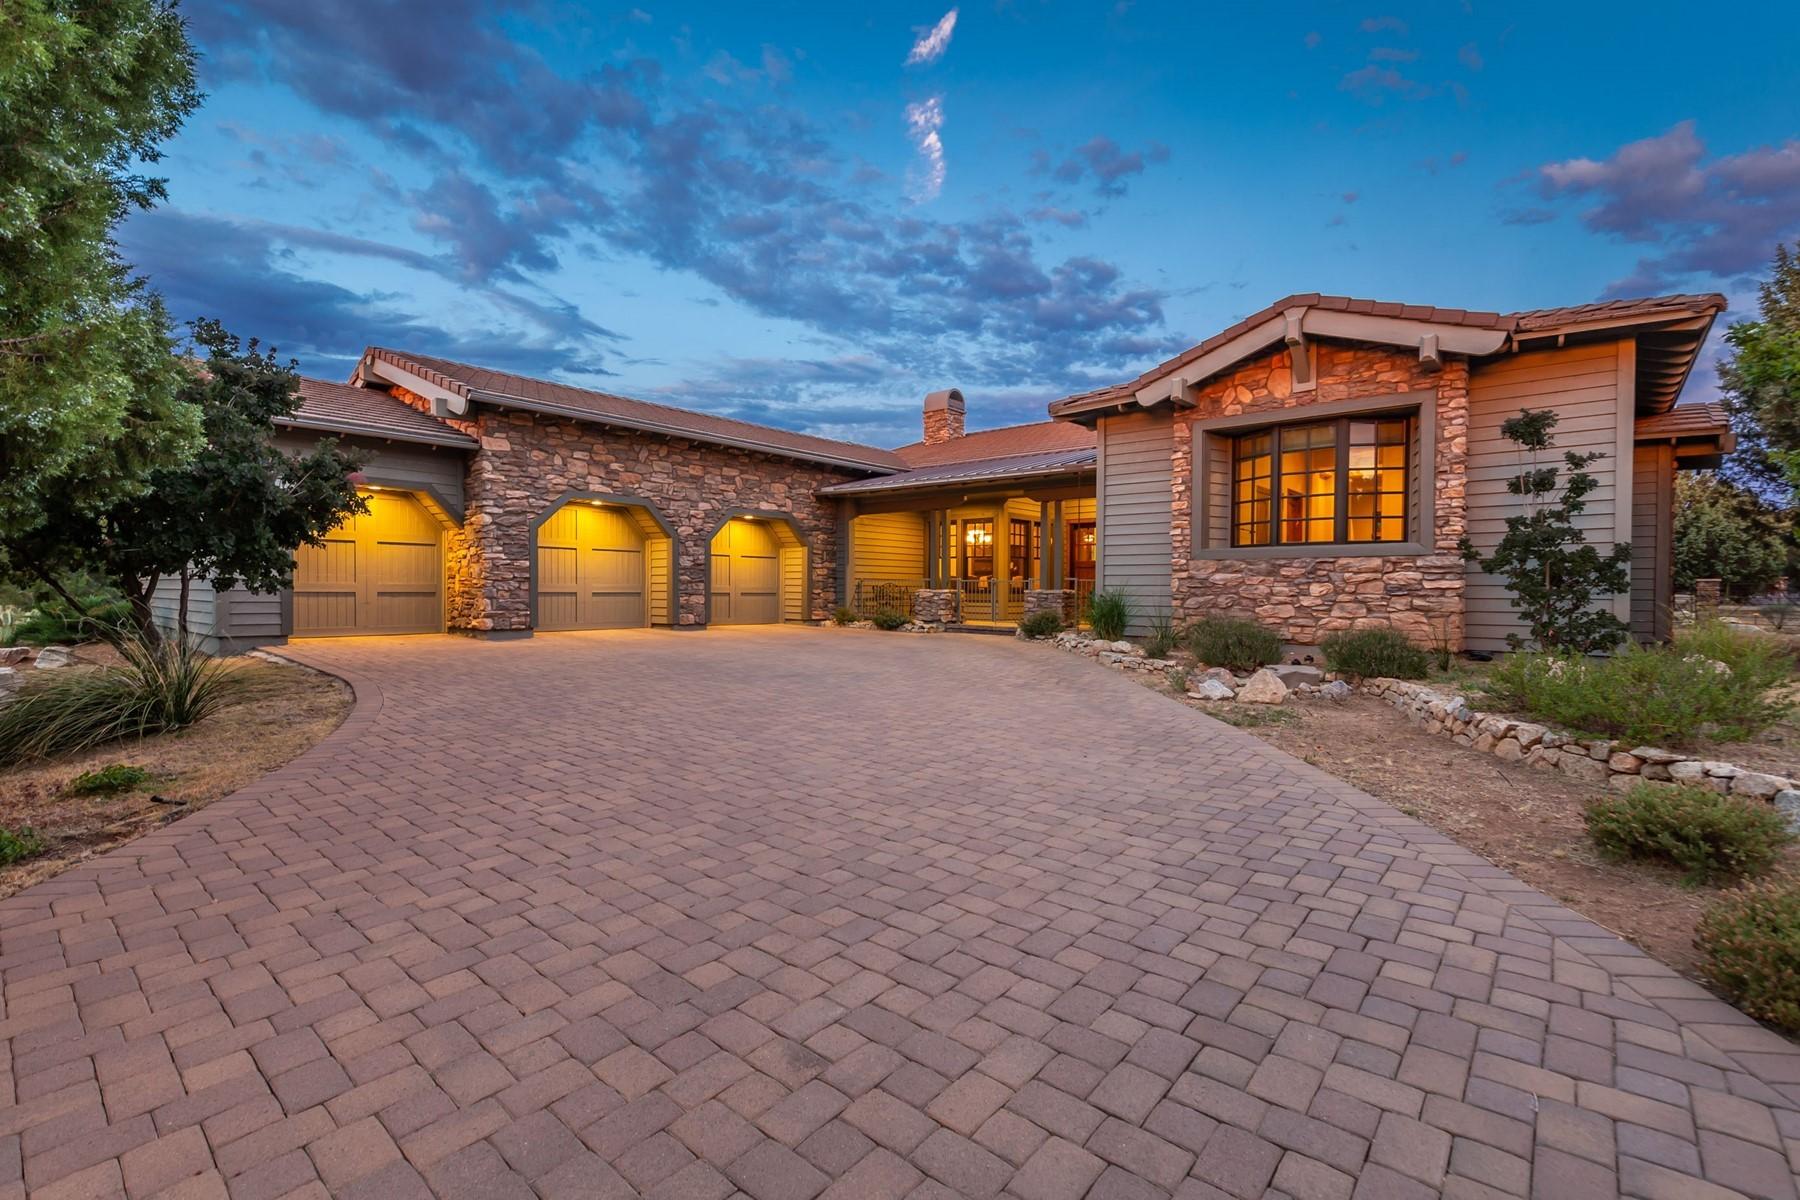 Single Family Homes for Active at Fantastic Custom Prescott Home 15055 Meander Mountain Way Prescott, Arizona 86305 United States